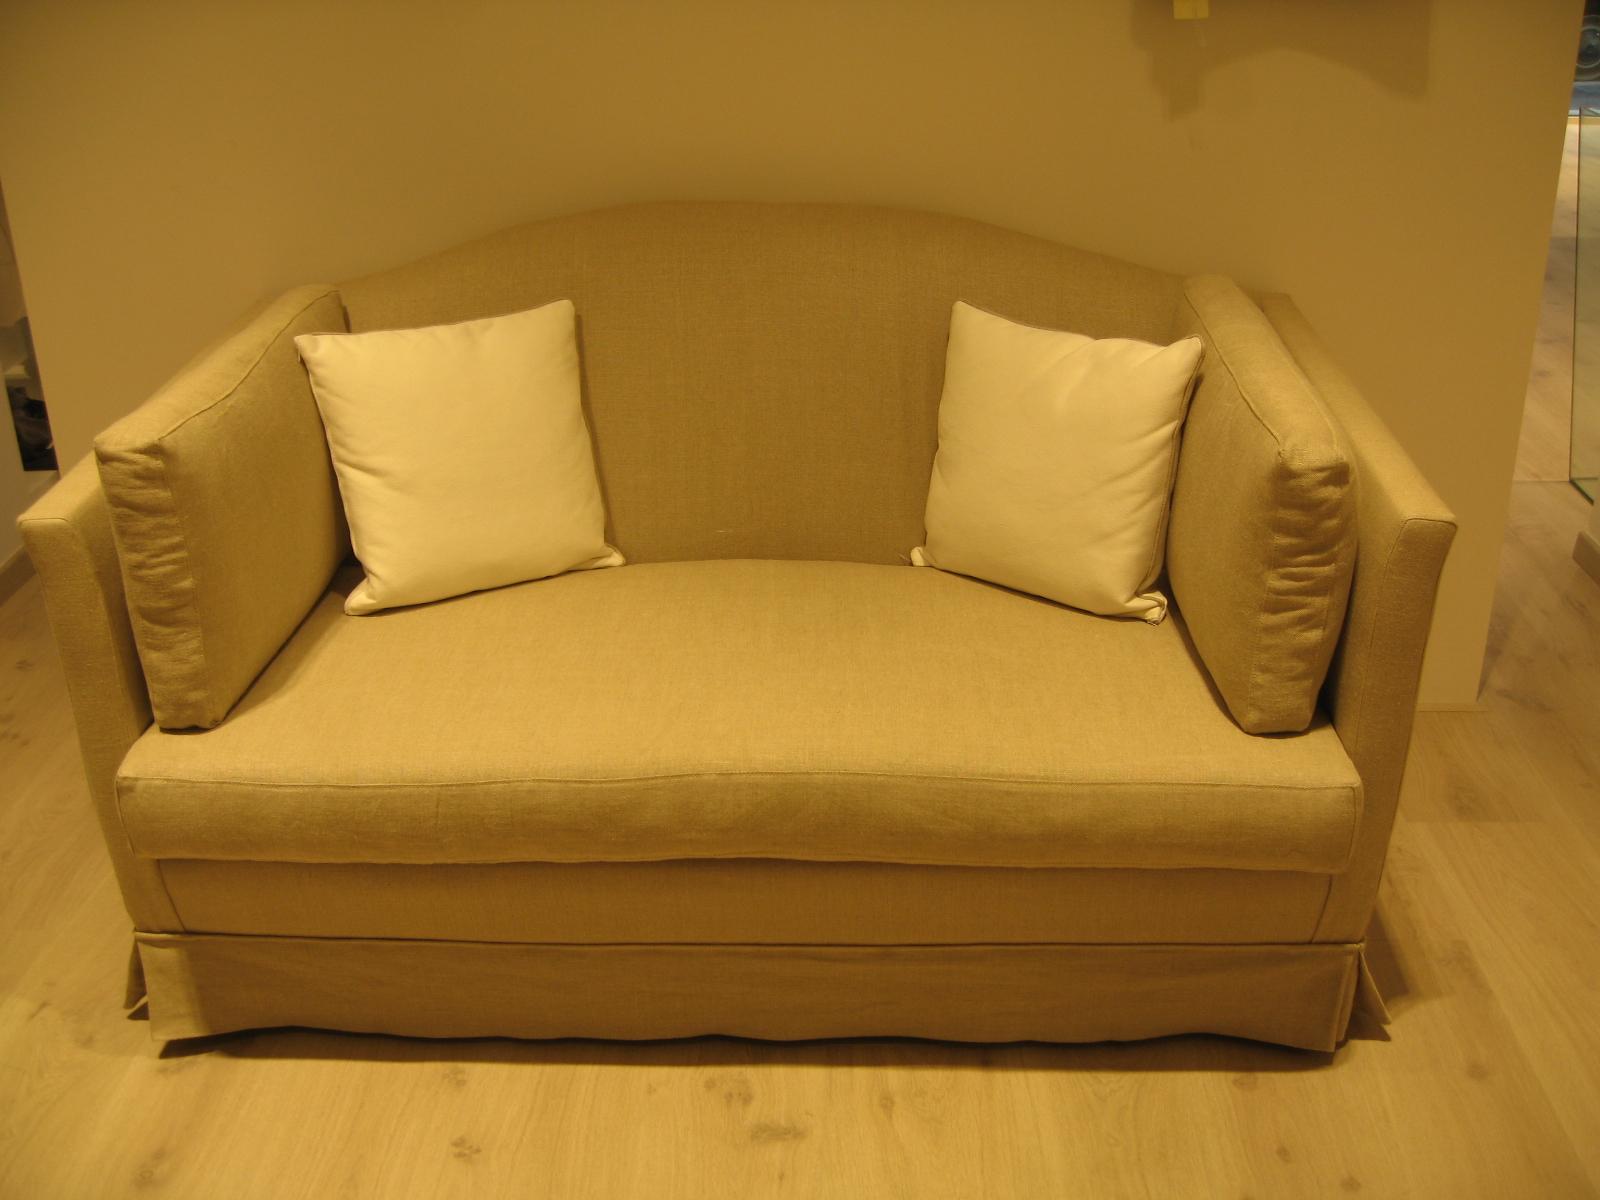 Tappezzeria per divani tappezzeria per divani moderni - Tessuti per divani moderni ...